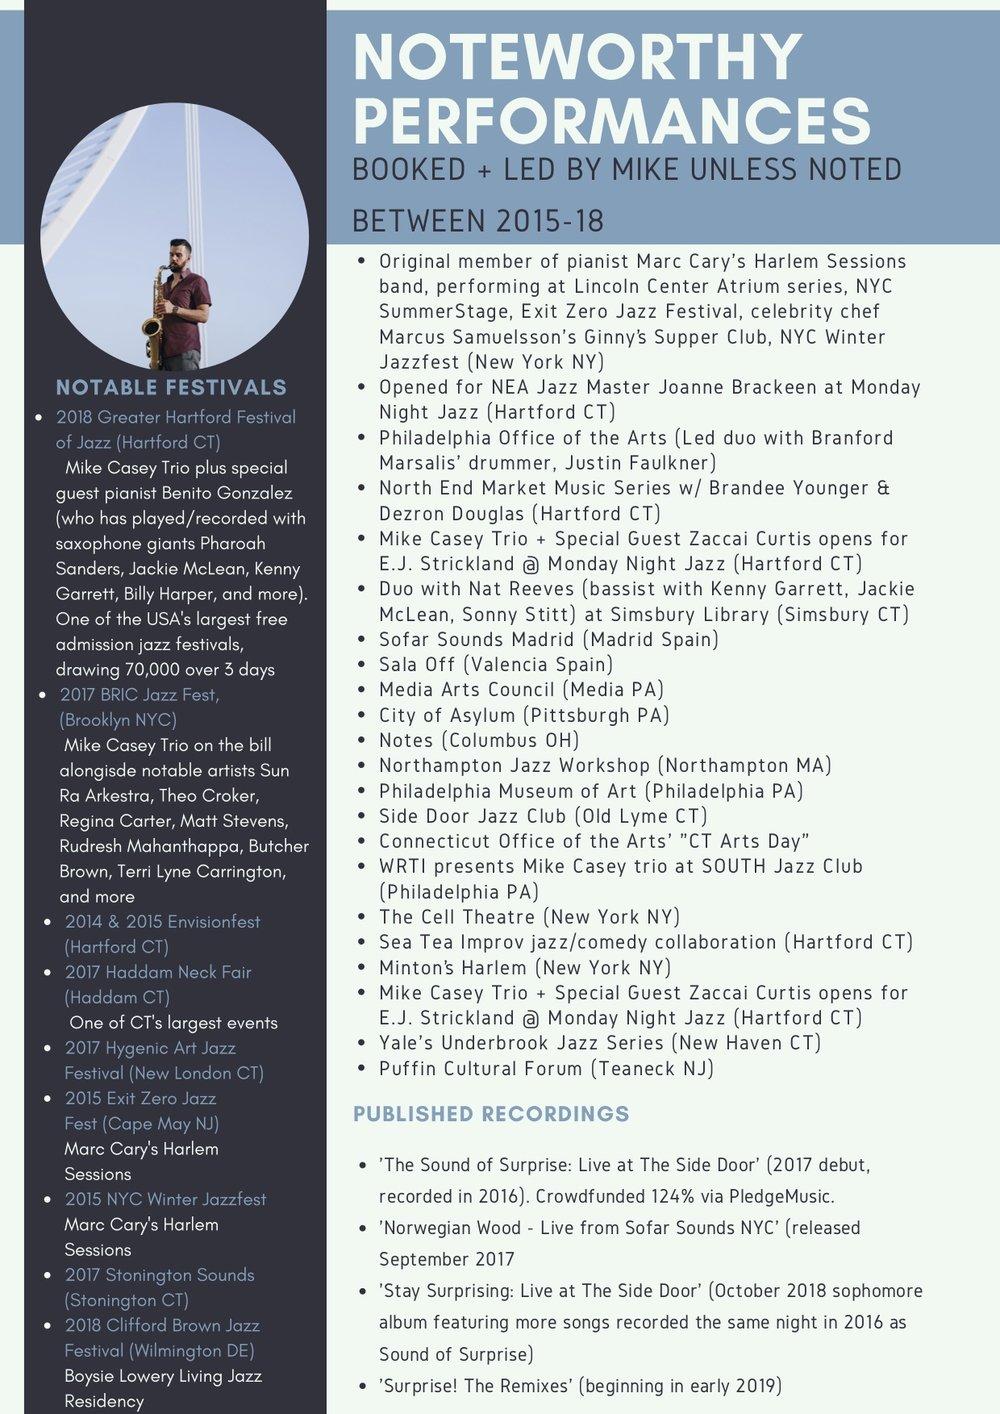 ASCAP HERB ALPRET PERFORMANCE LISTING.jpg